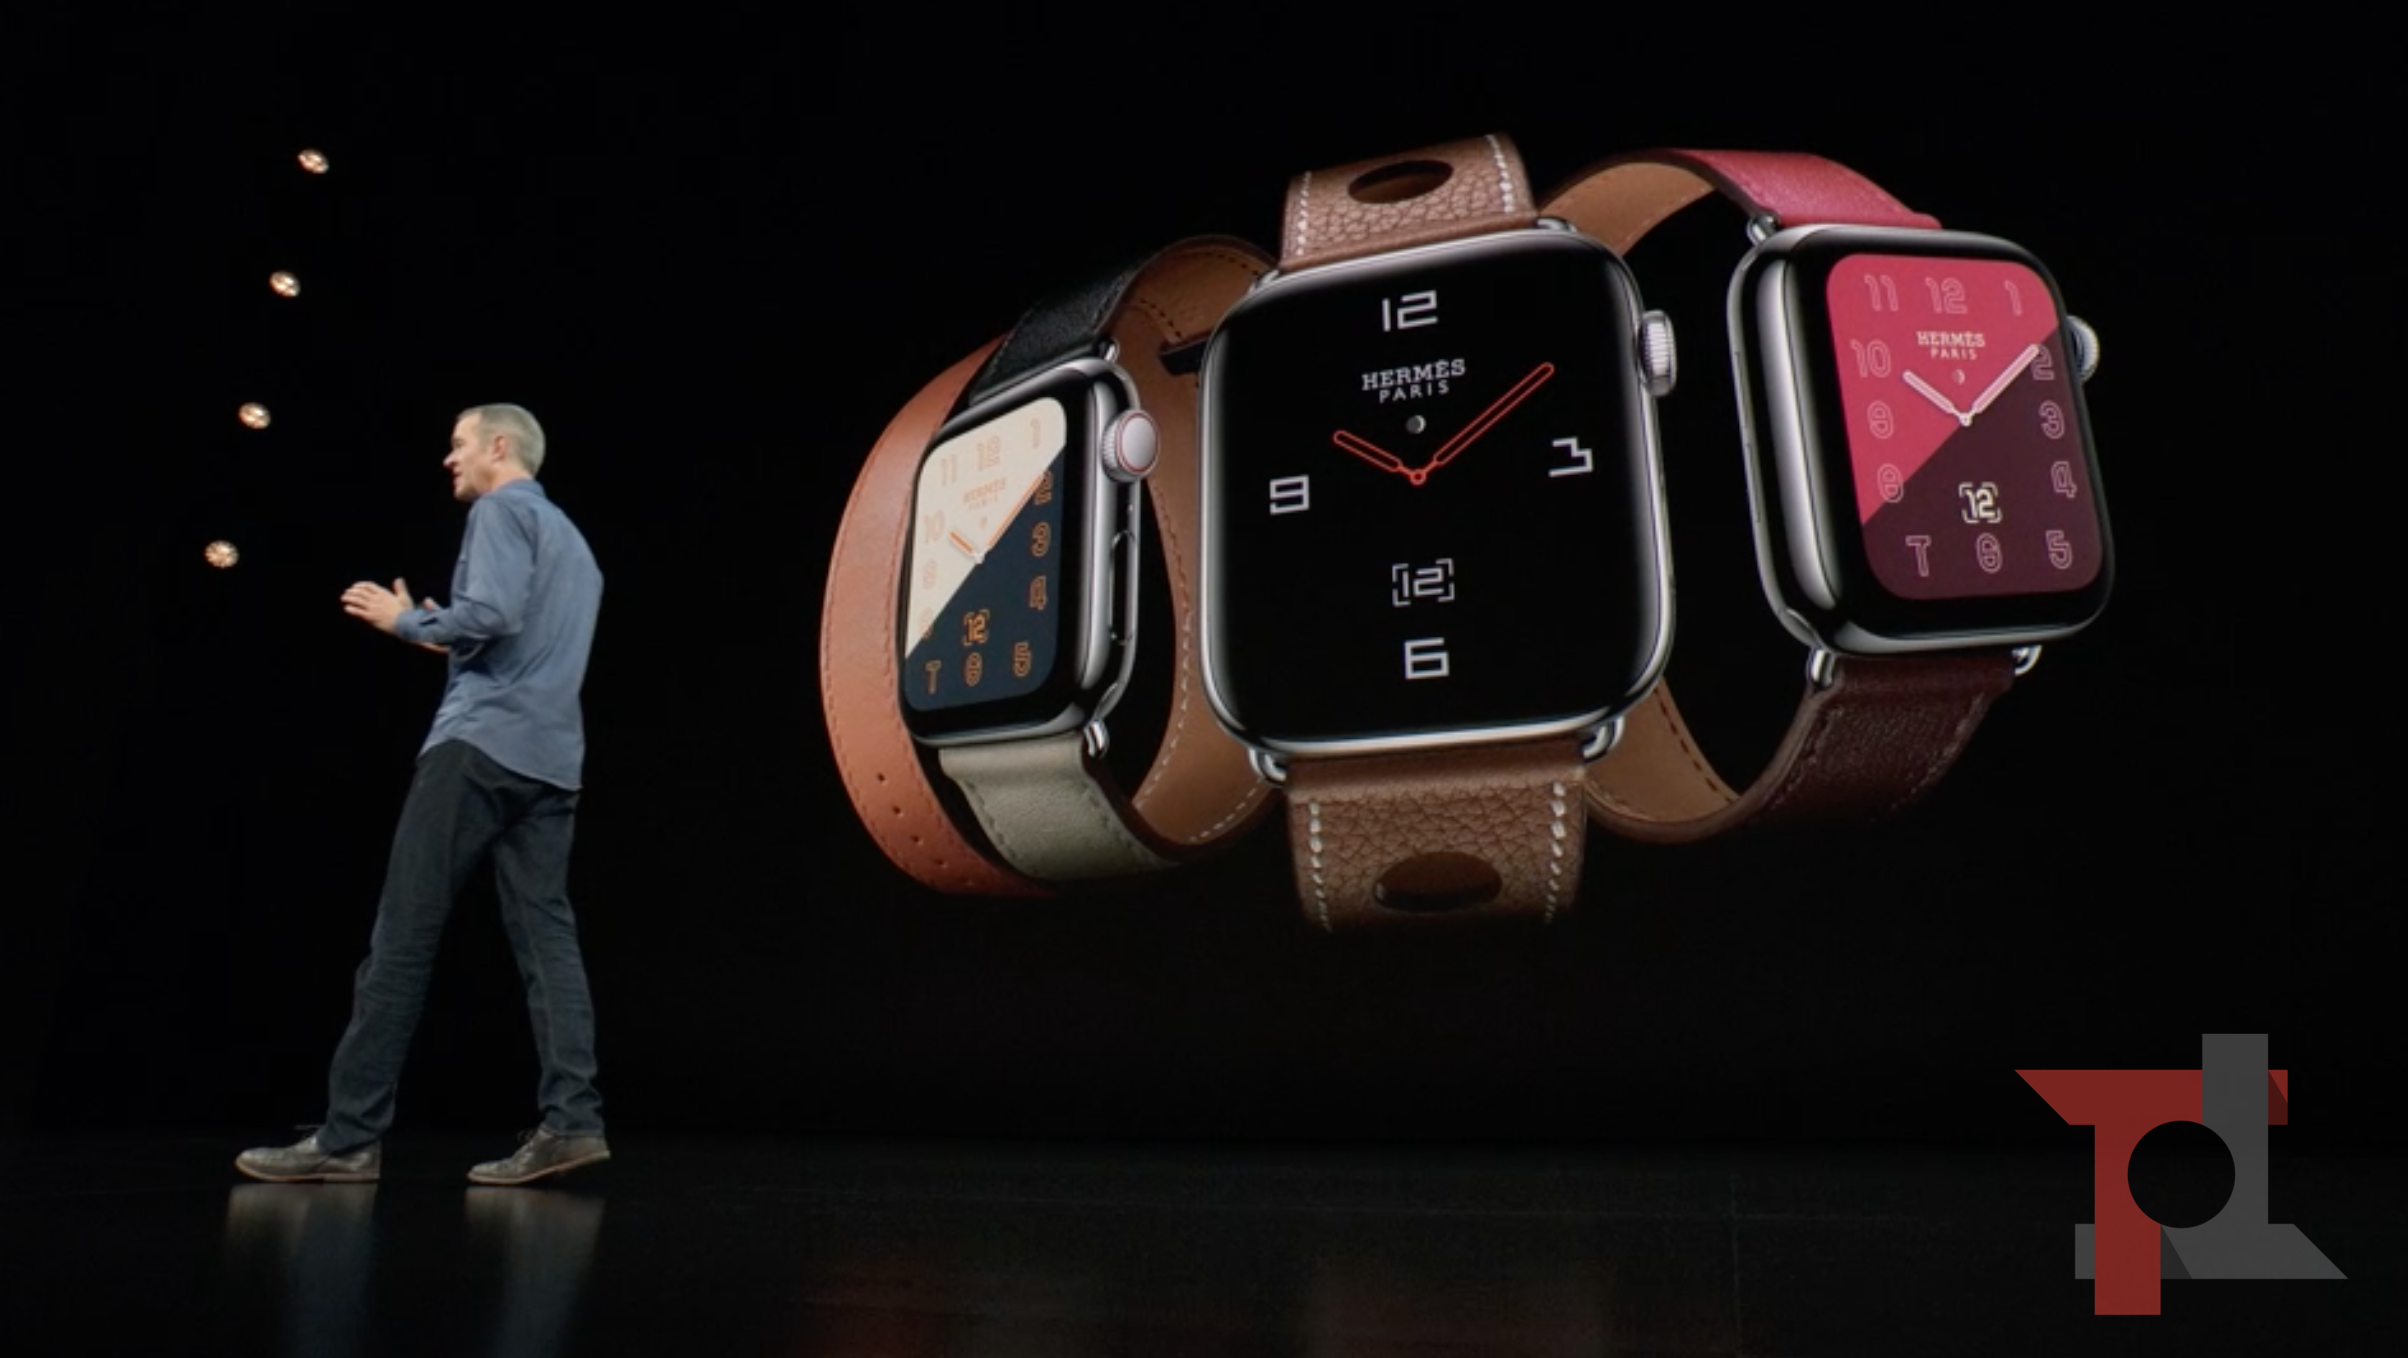 Apple Watch Series 4 ufficiali: eleganti e ricchi di funzioni, ovviamente costosi 5